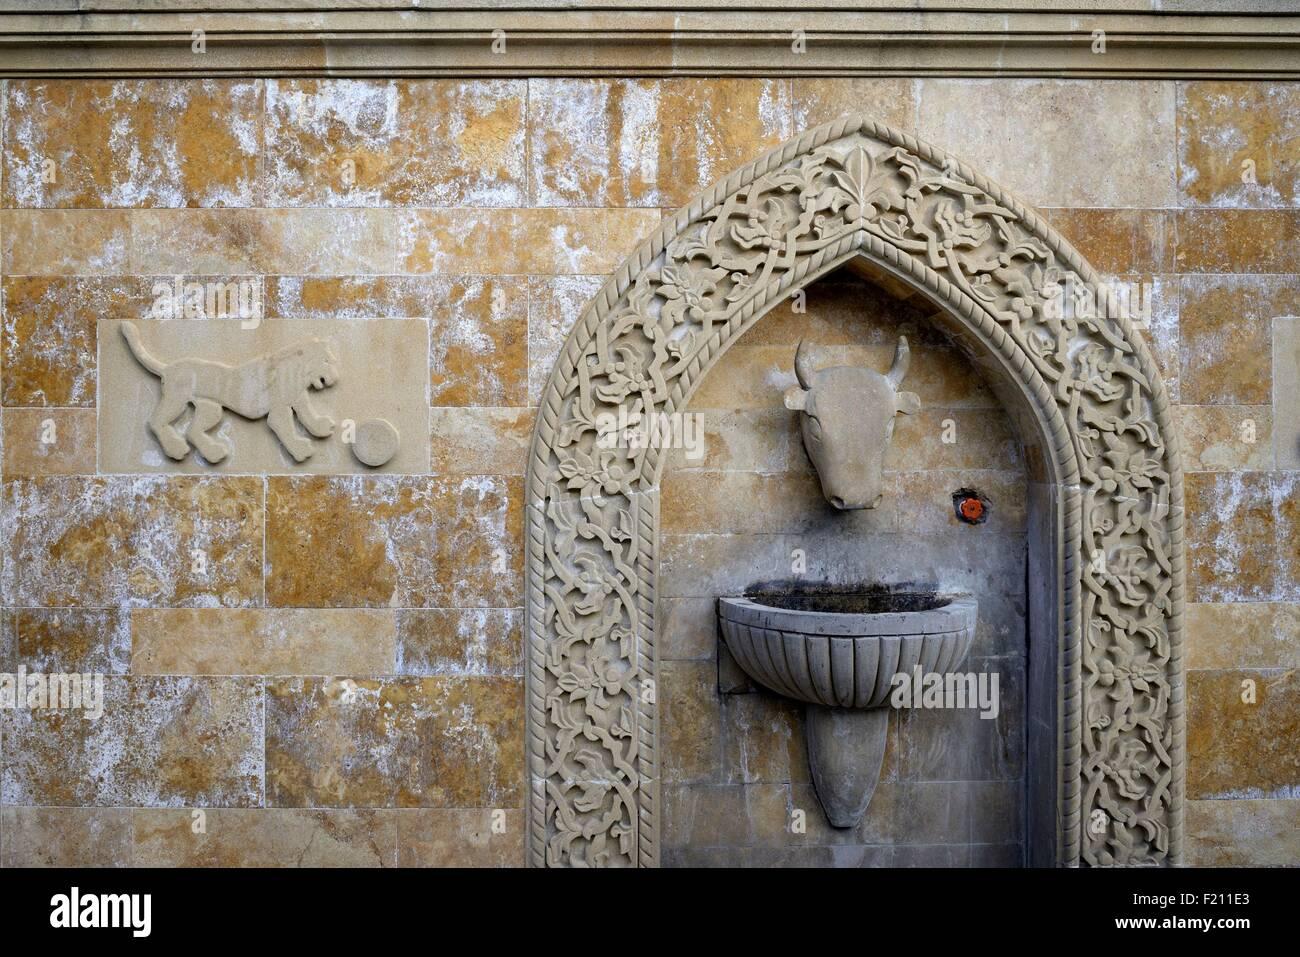 Azerbaijan, Baku, the Old City (Old Town, Ichari Shahar) listed as World Heritage by UNESCO, fountain - Stock Image